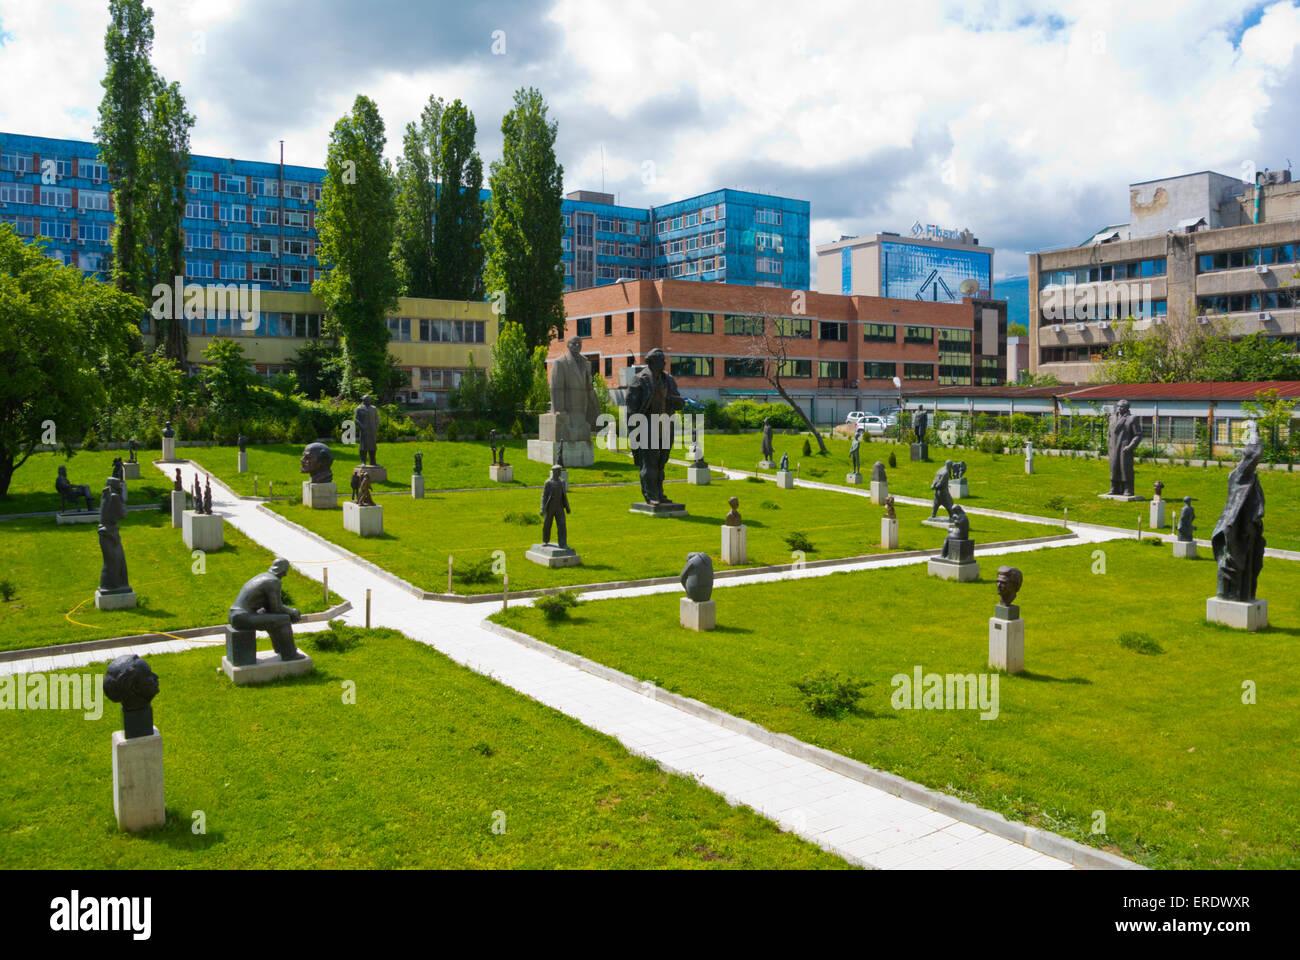 Sozialistischen Kunstmuseum, Izgrev District, Sofia, Bulgarien, Europa Stockbild